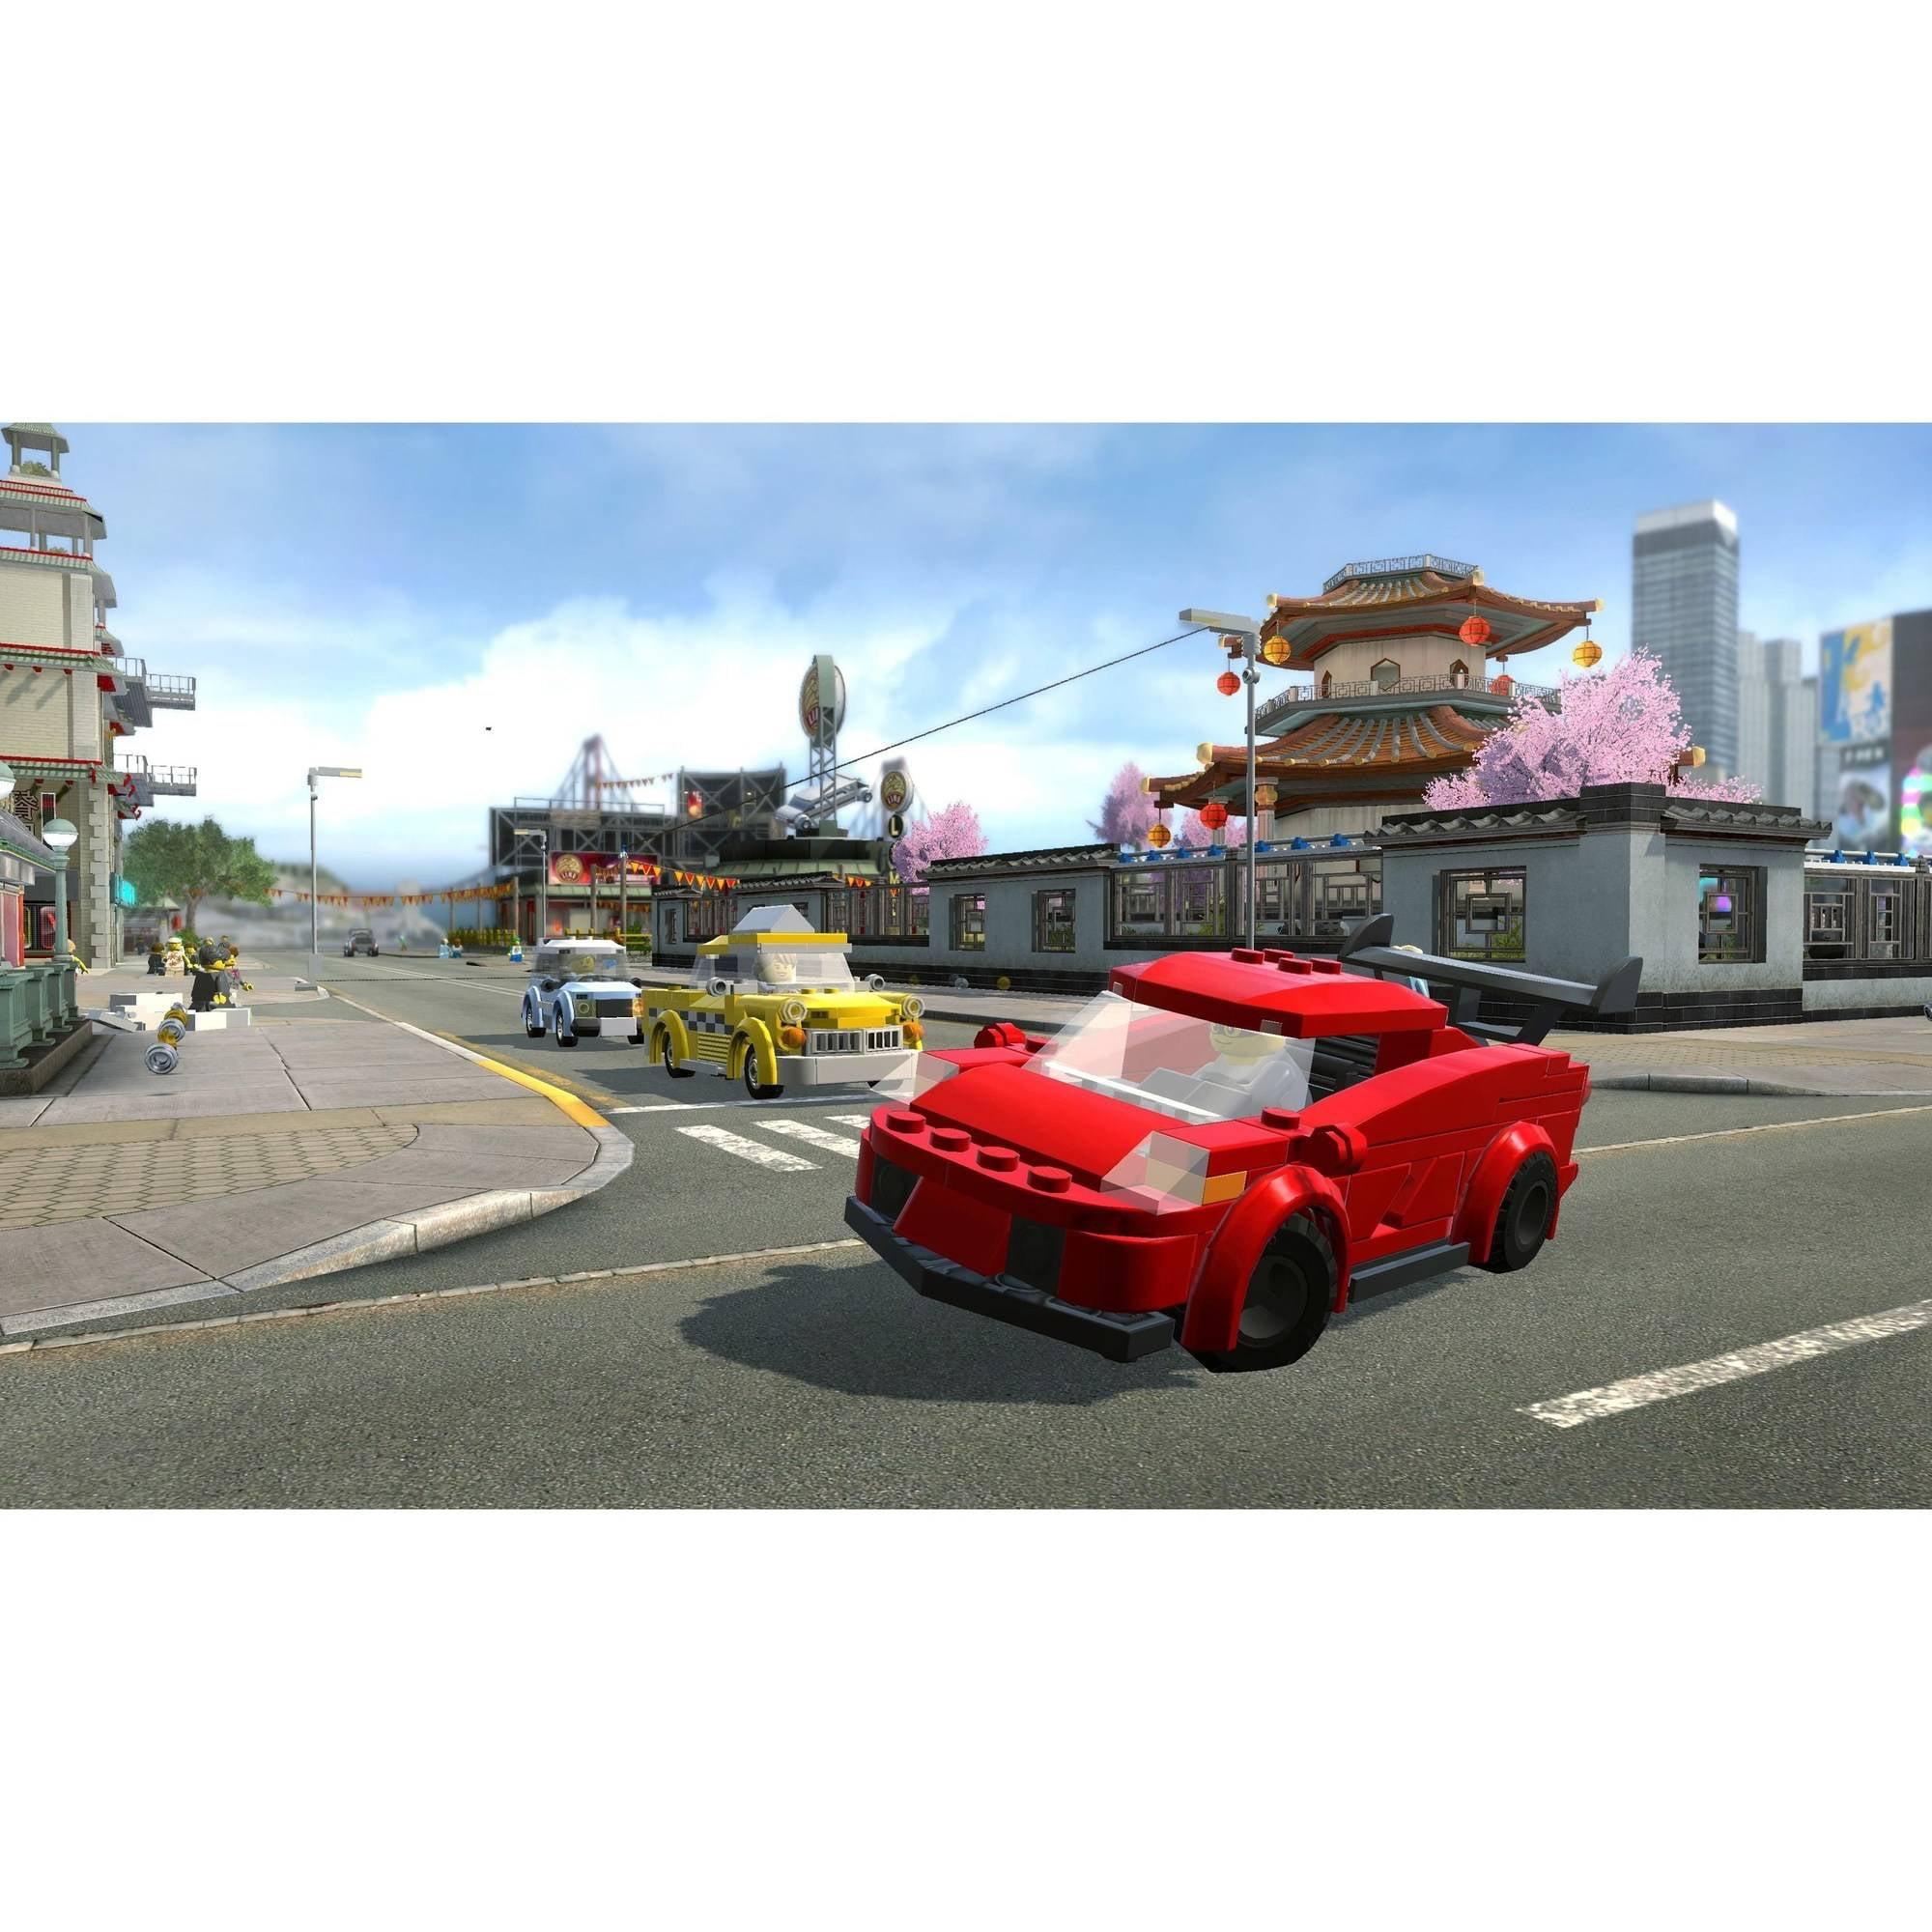 Lego City Undercover Warner Bros Xbox One Walmartcom